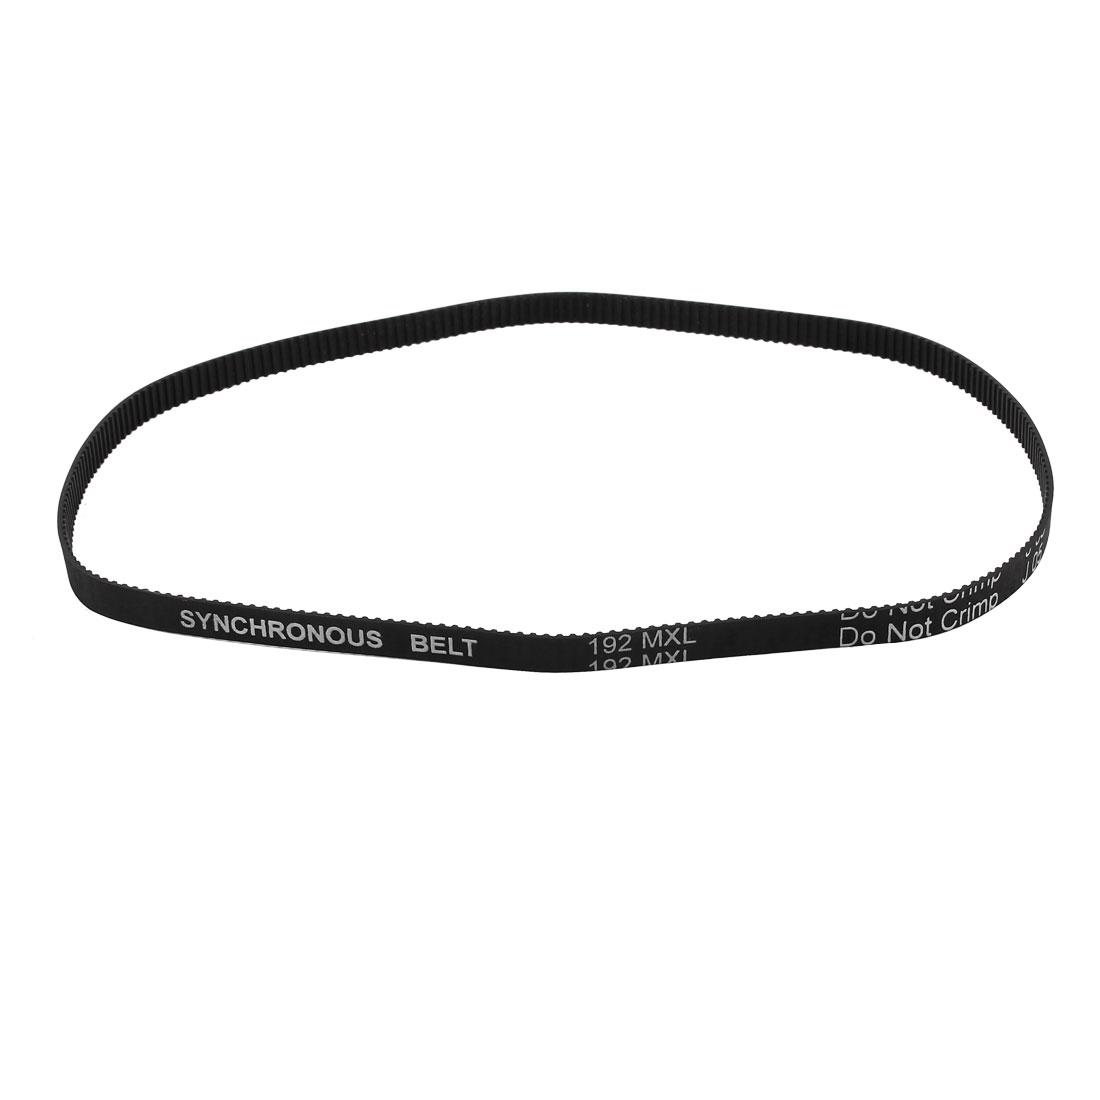 192MXL 025 240 Teeth 2.032mm Pitch 6.4mm Width Industrial Timing Belt Black